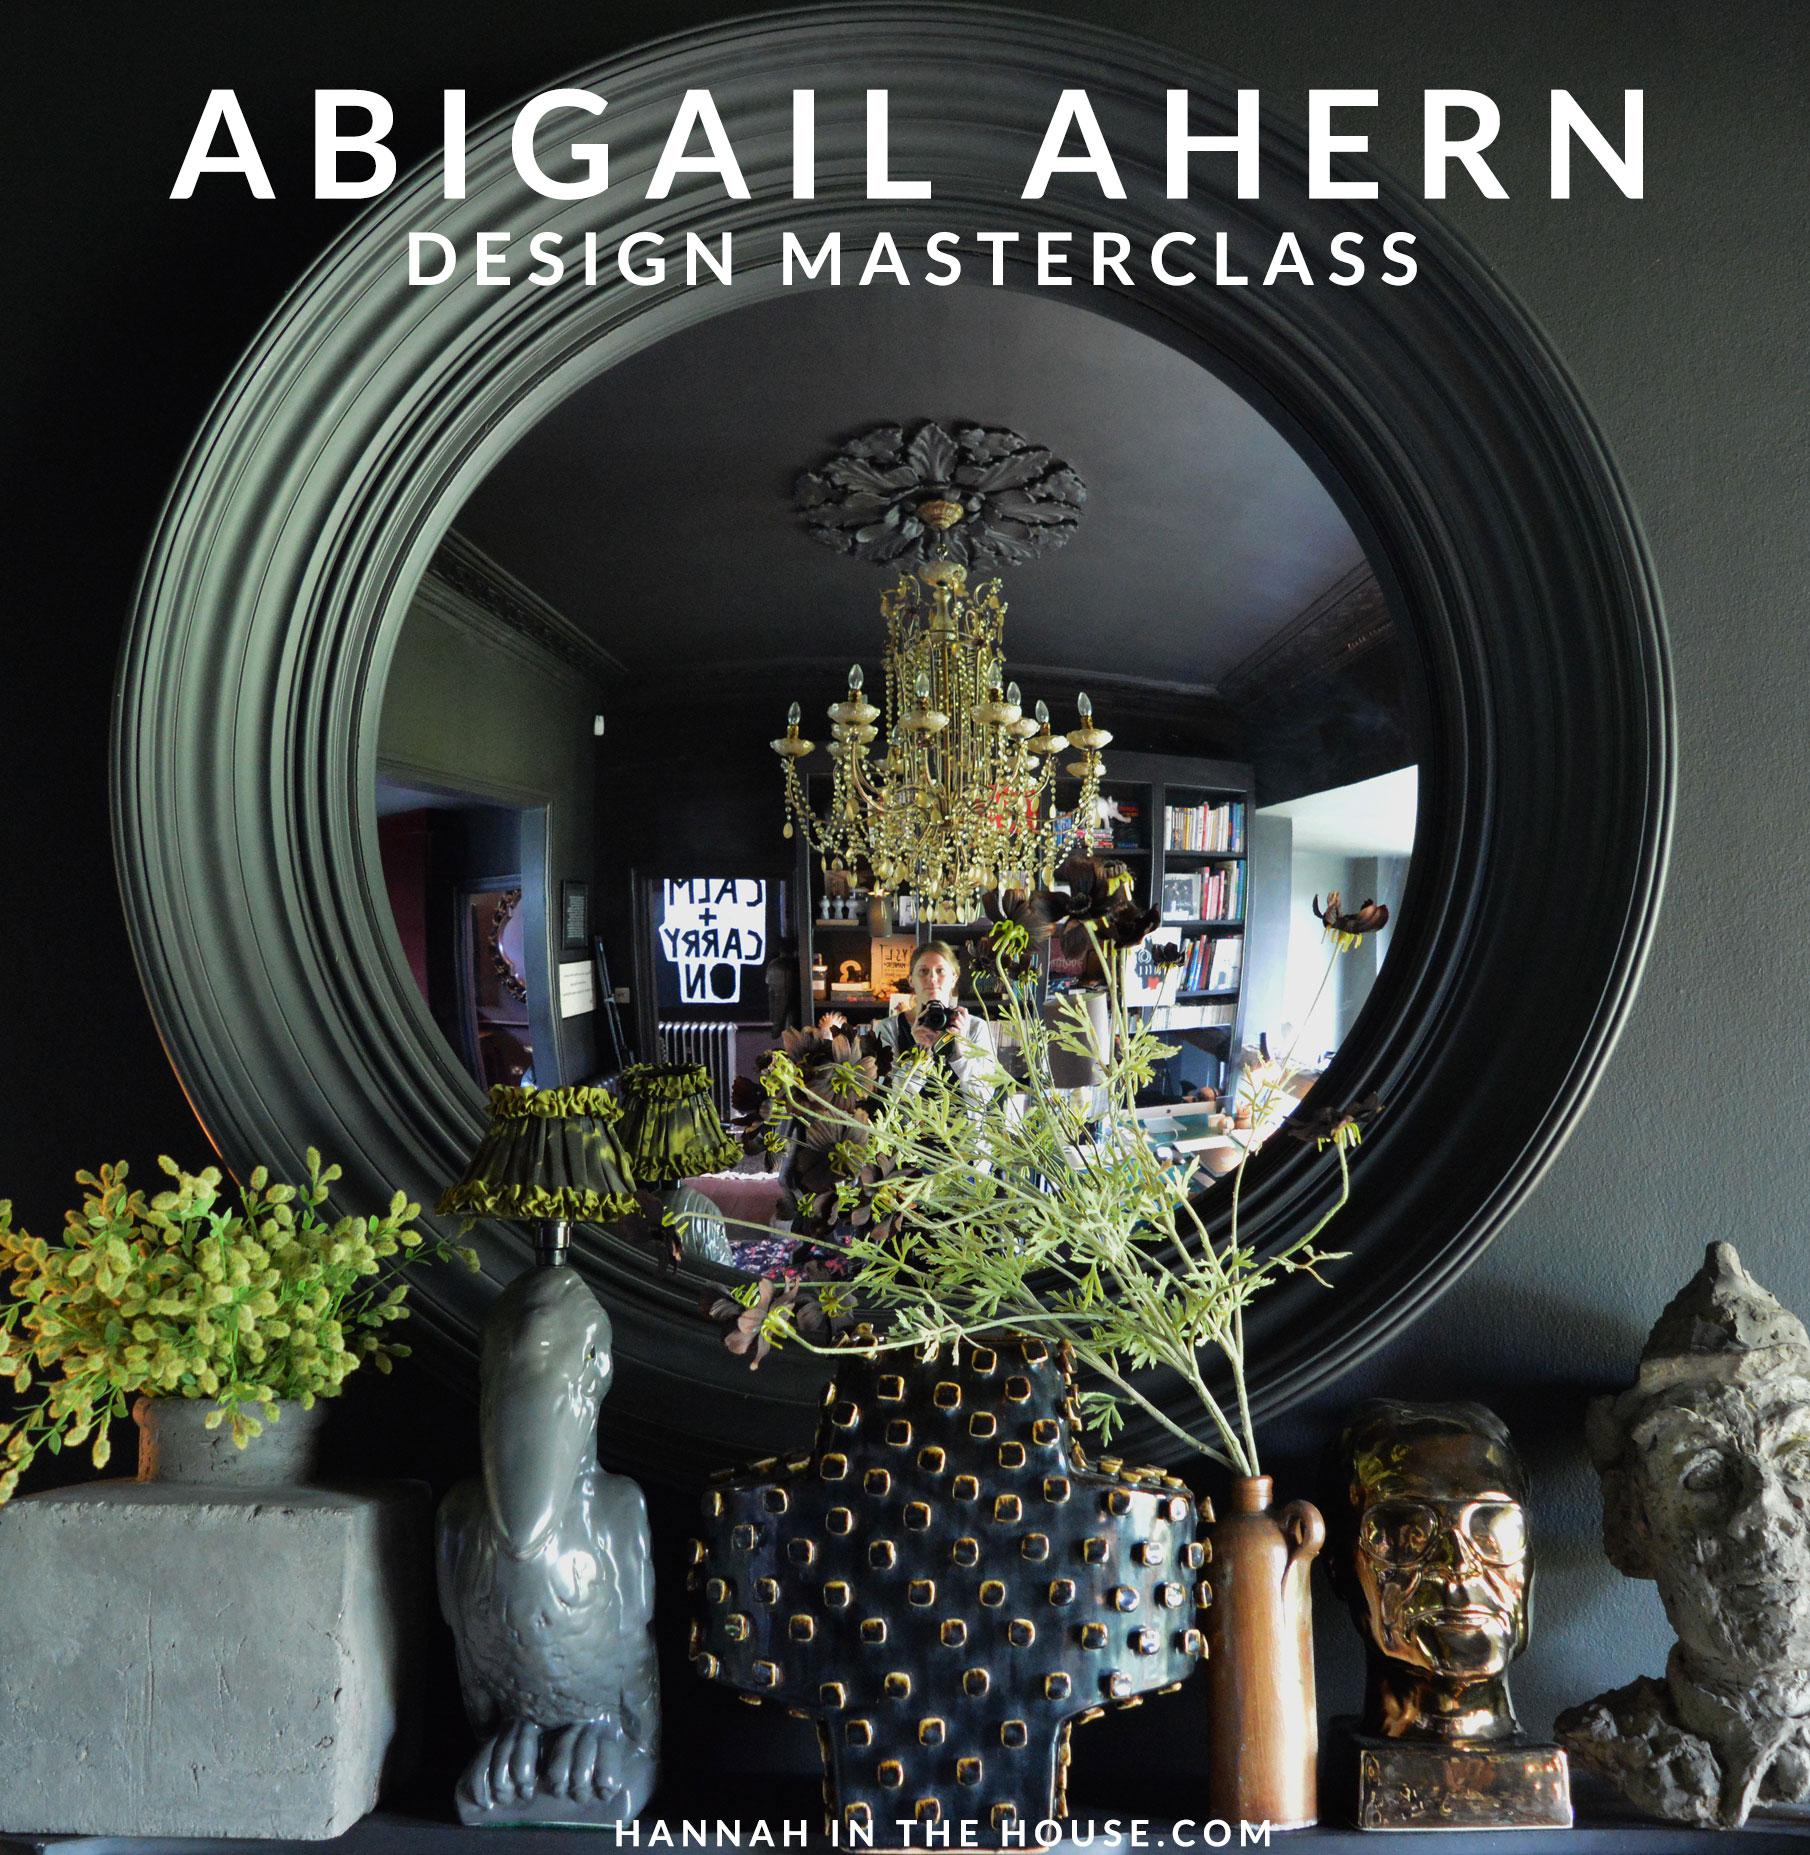 Abigail Ahern S Design Masterclass Hannah Trickett